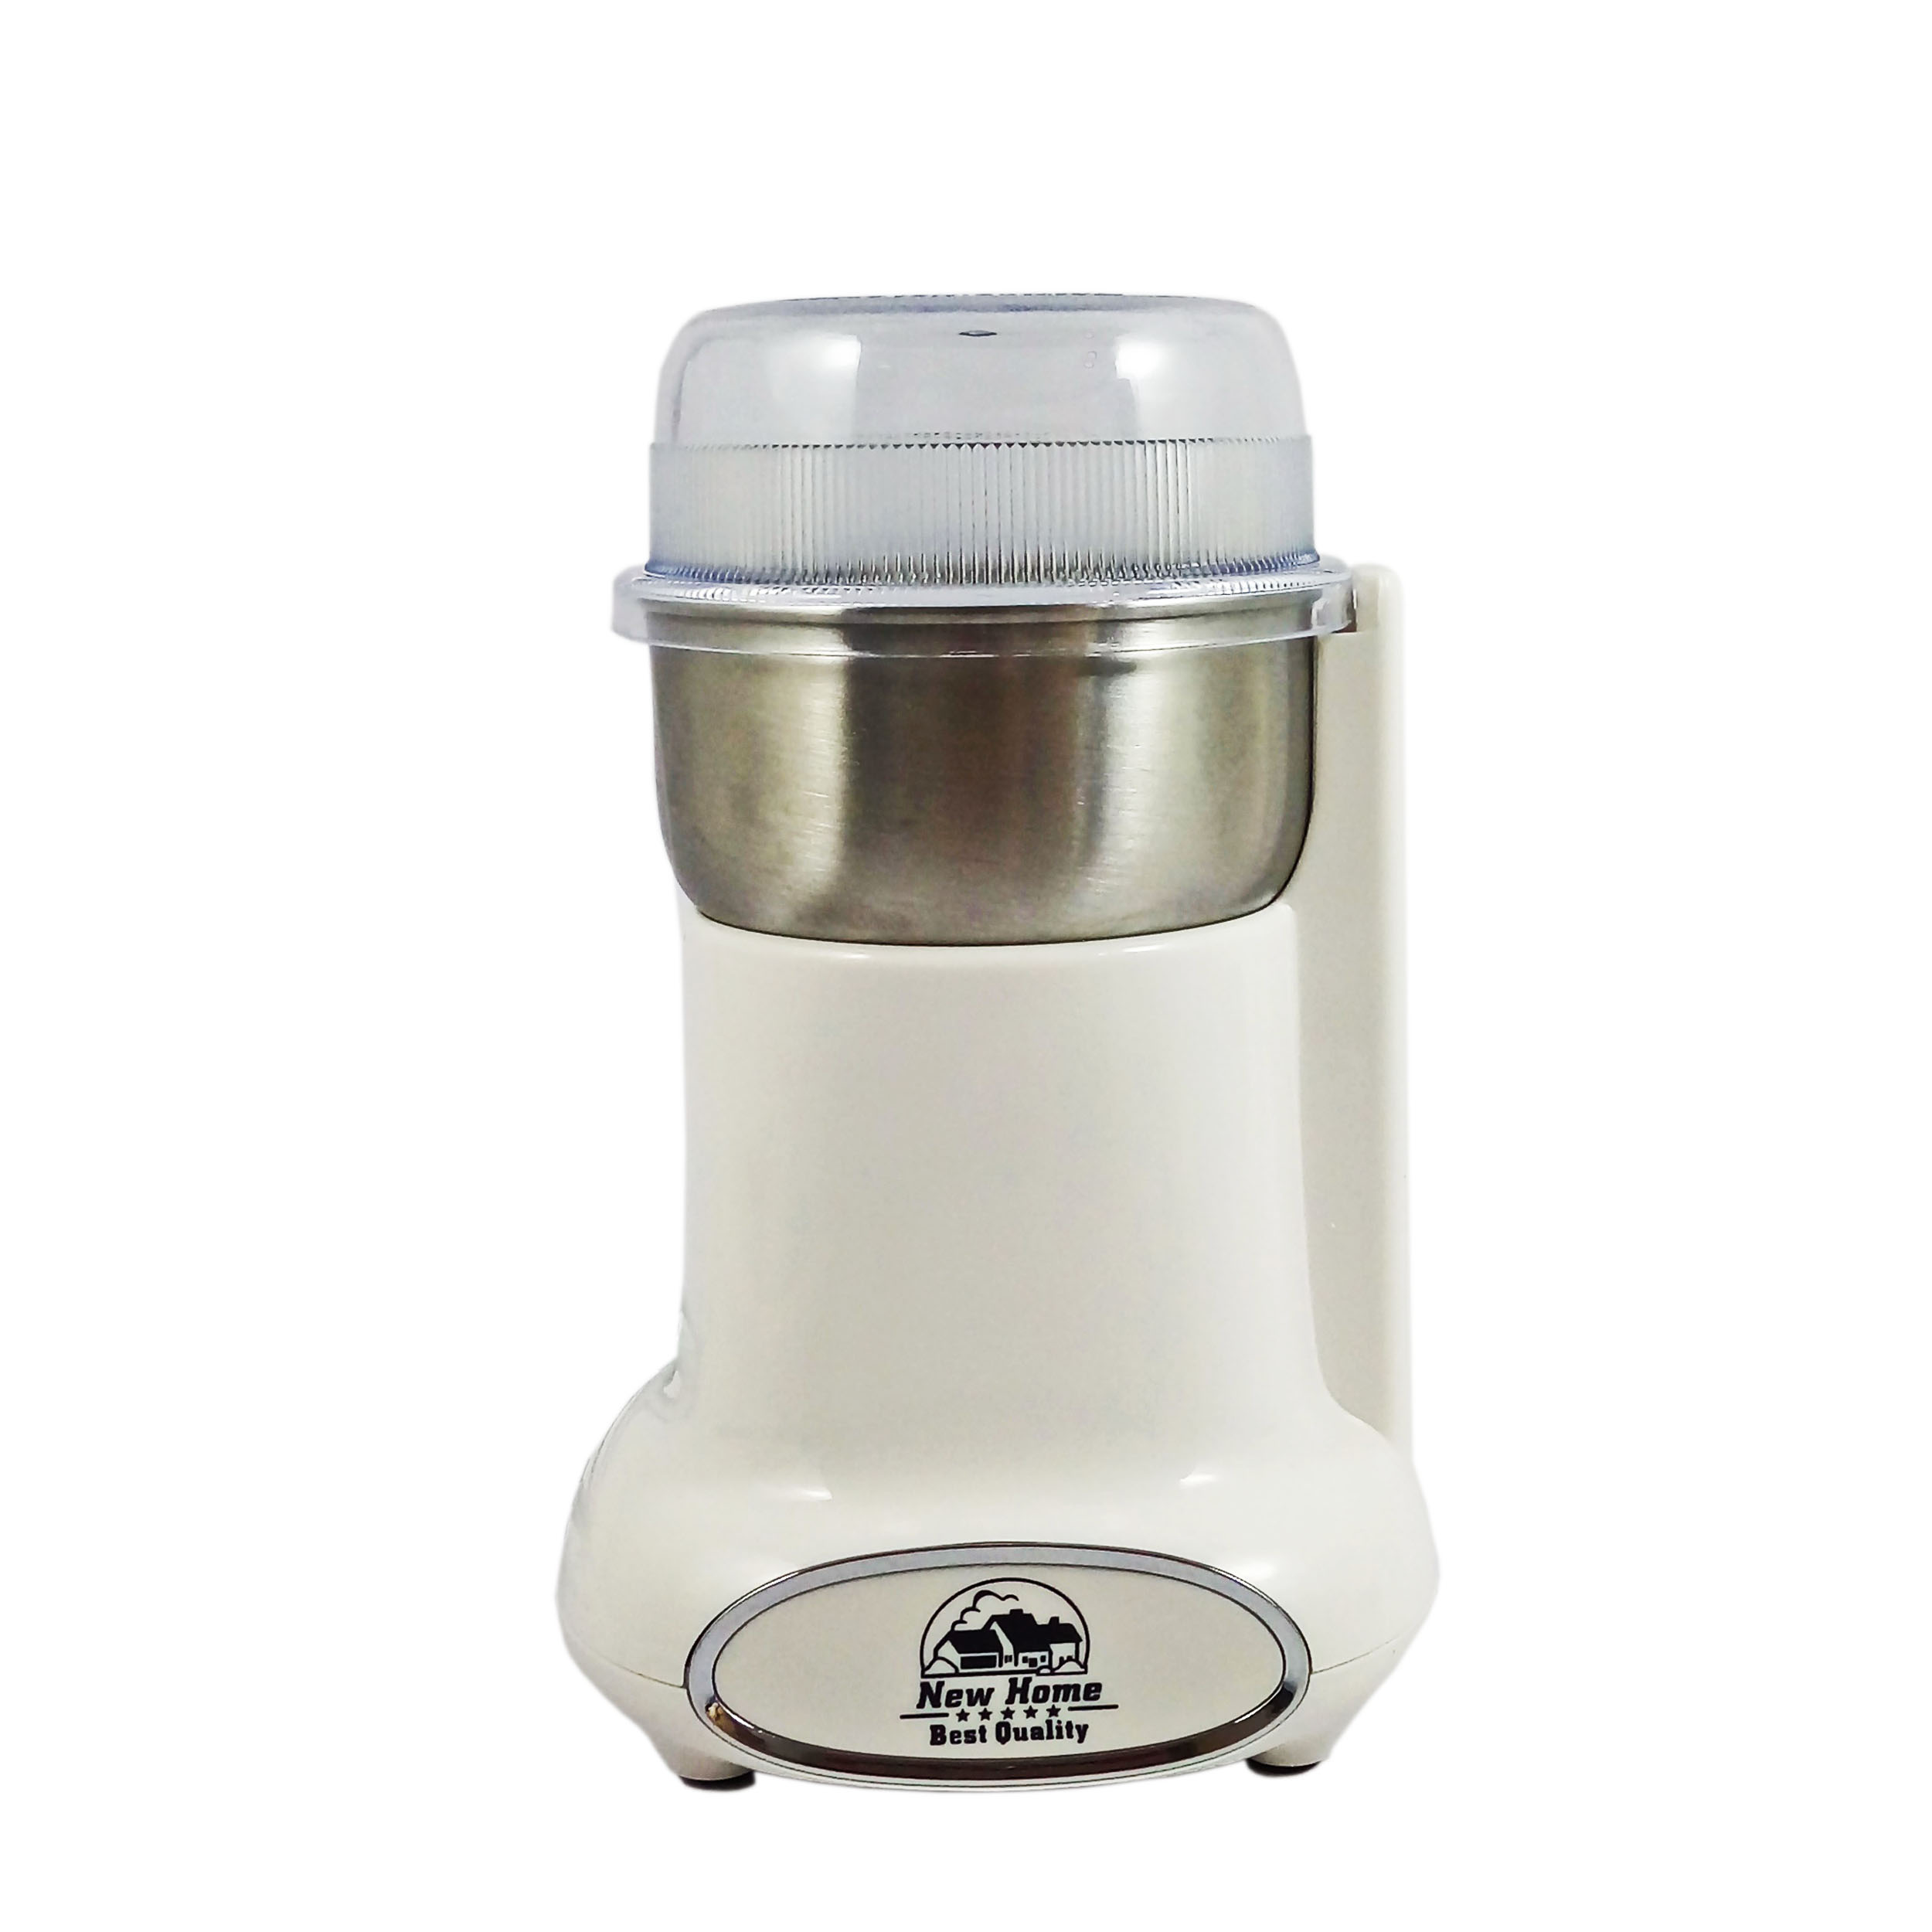 آسیاب قهوه نیوهوم مدل NHG-502